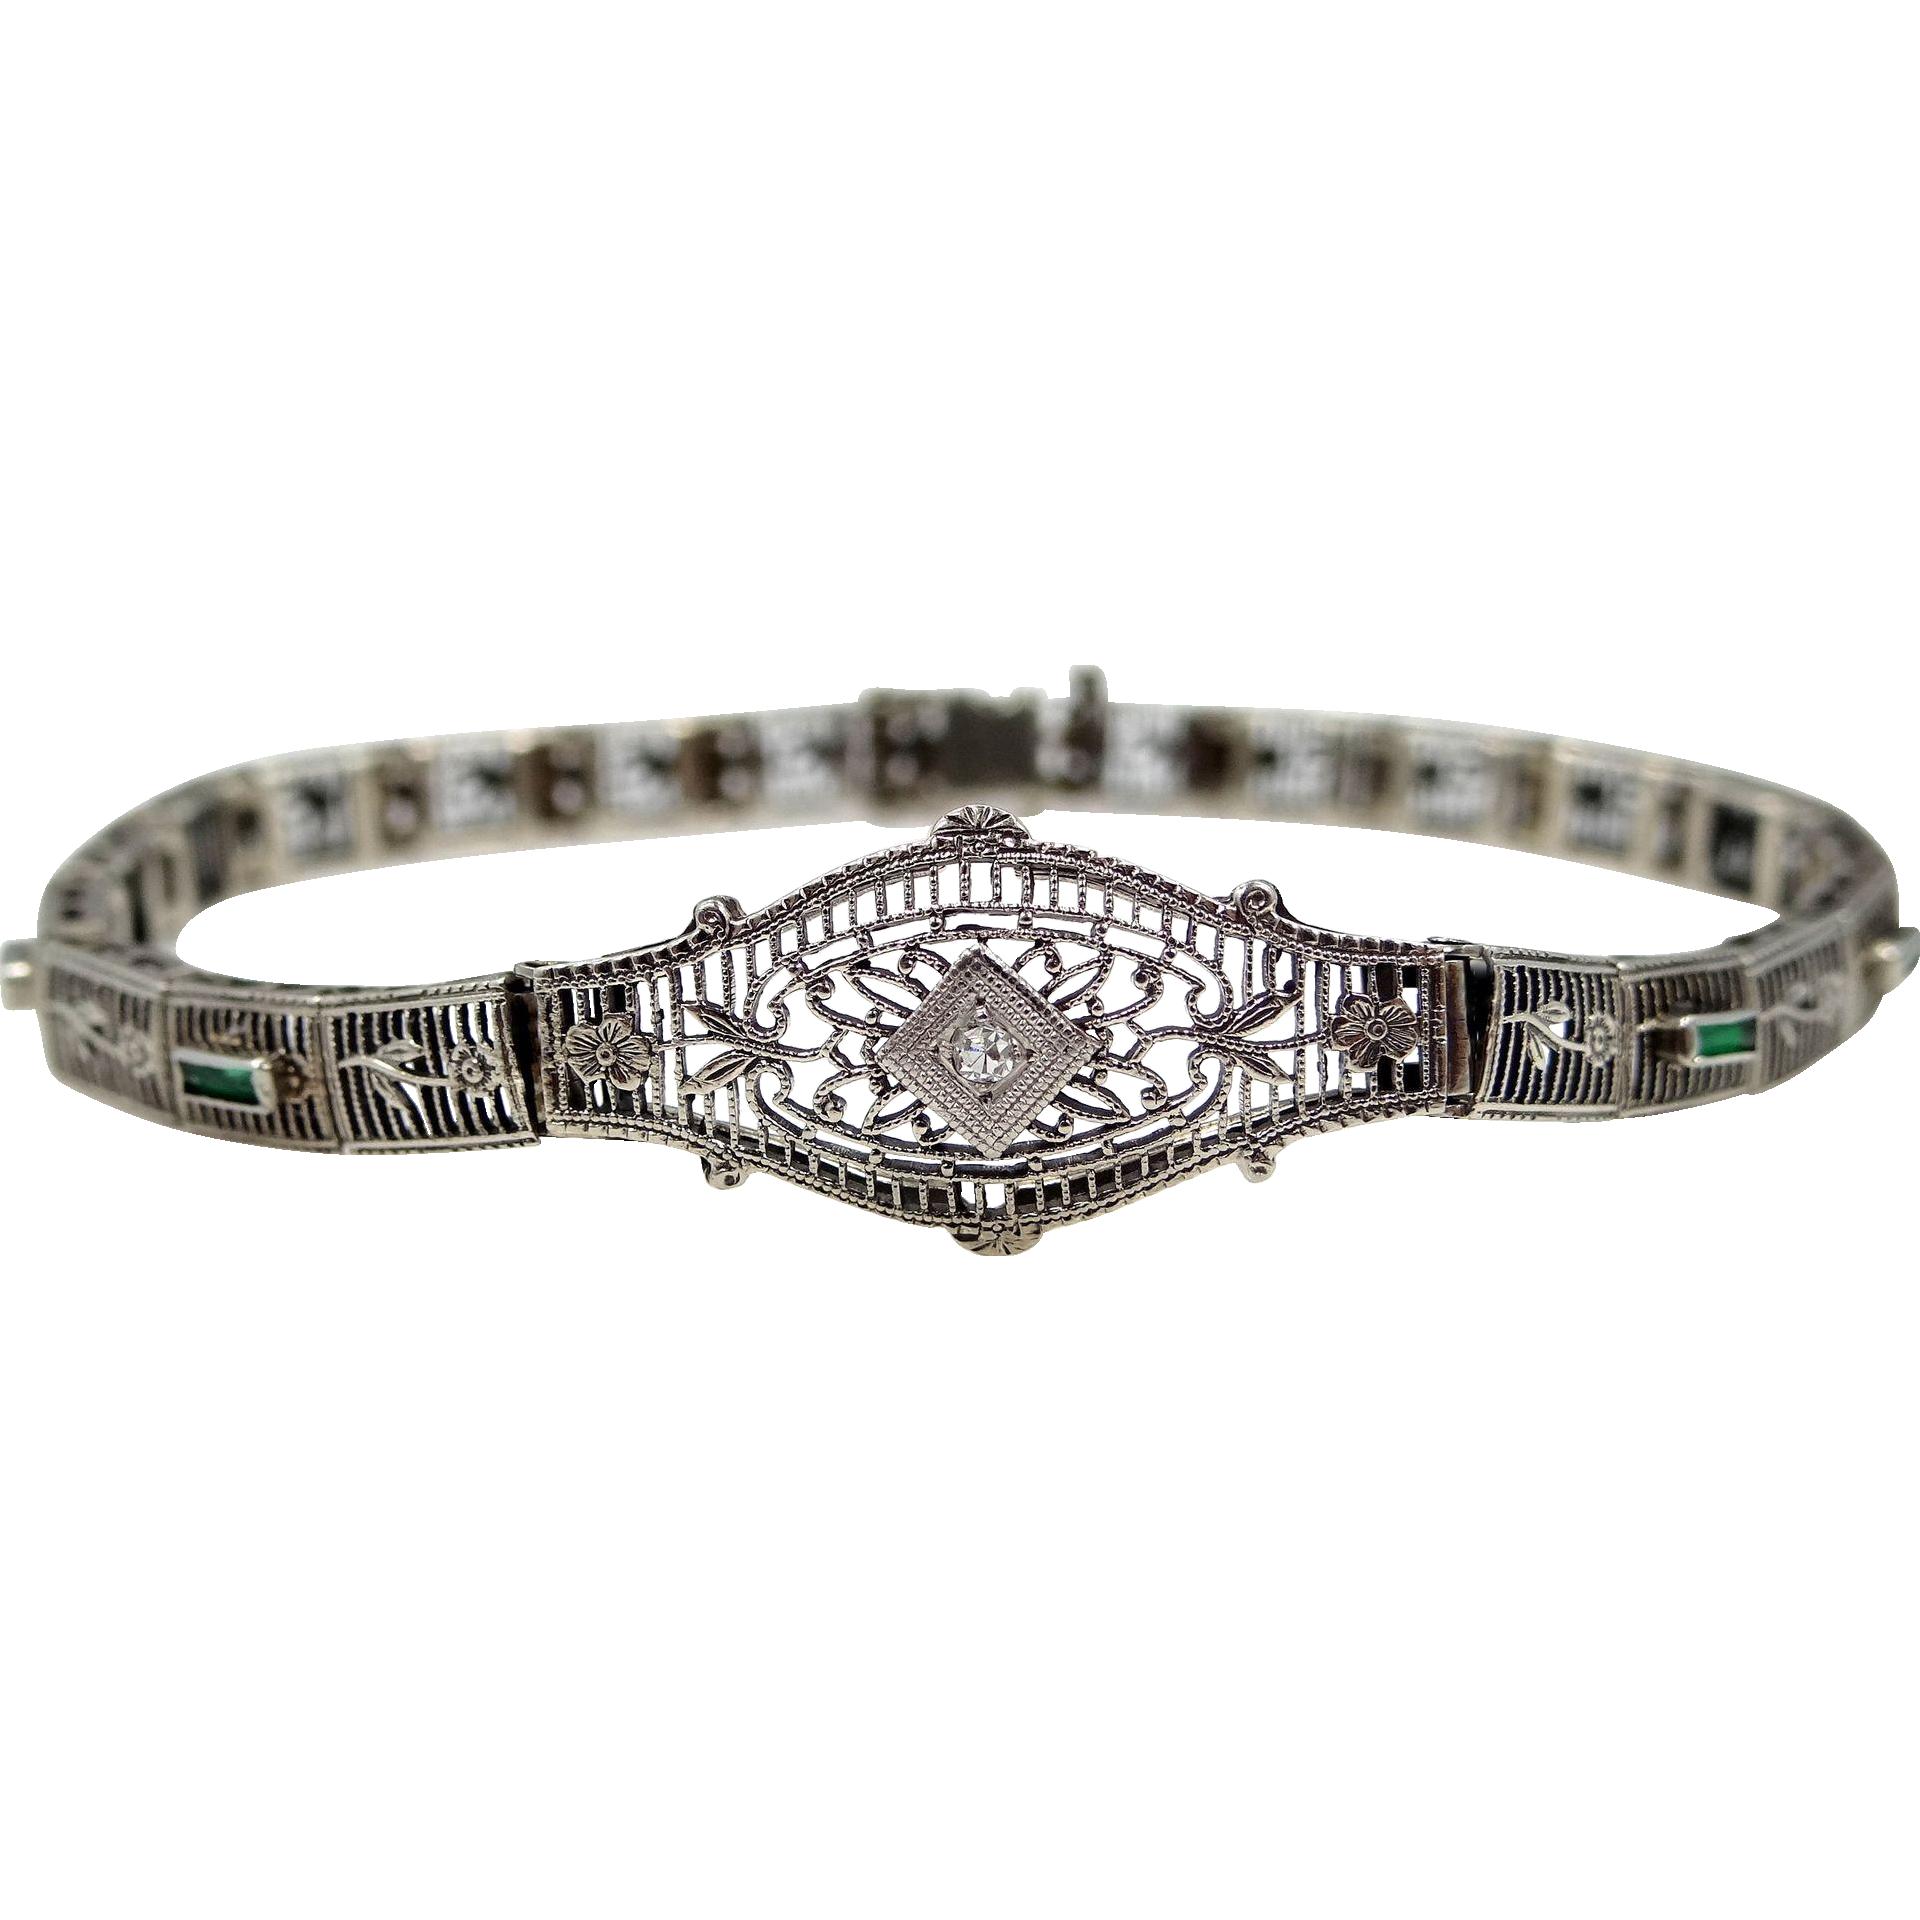 Art Deco 14k White Gold Filigree Diamond Bracelet